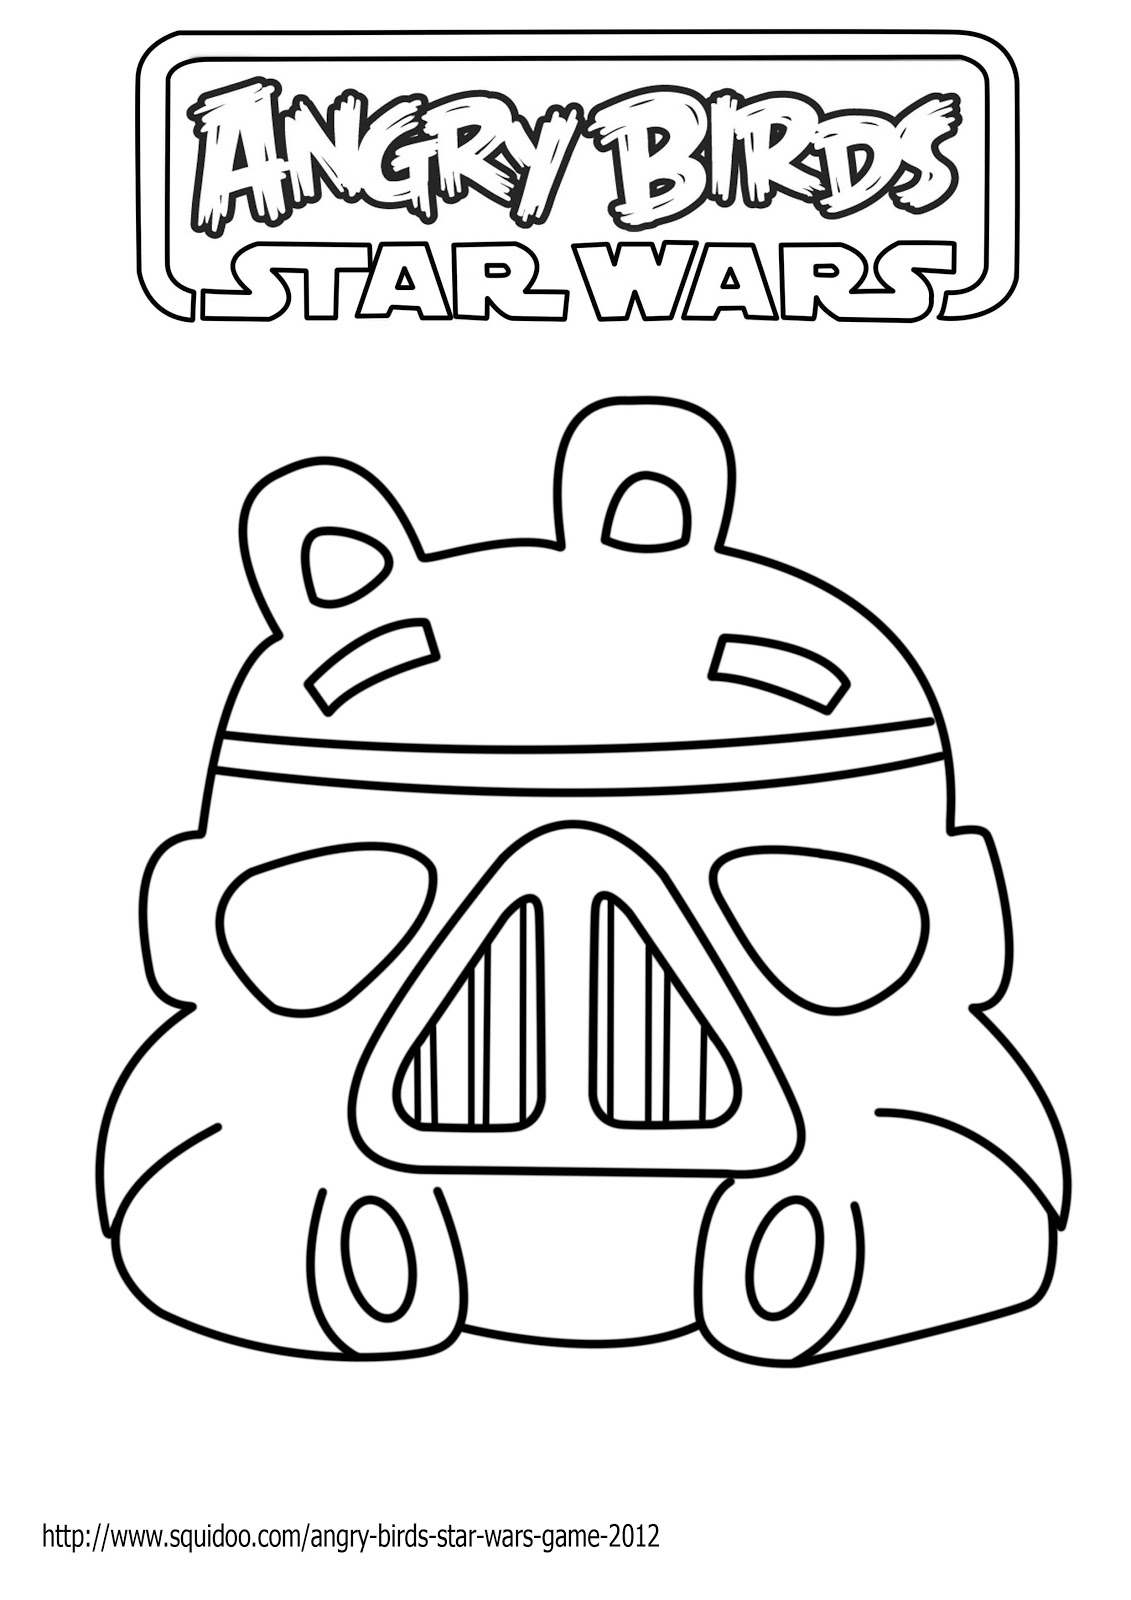 Star Wars coloring Pages  eColoringPagecom Printable